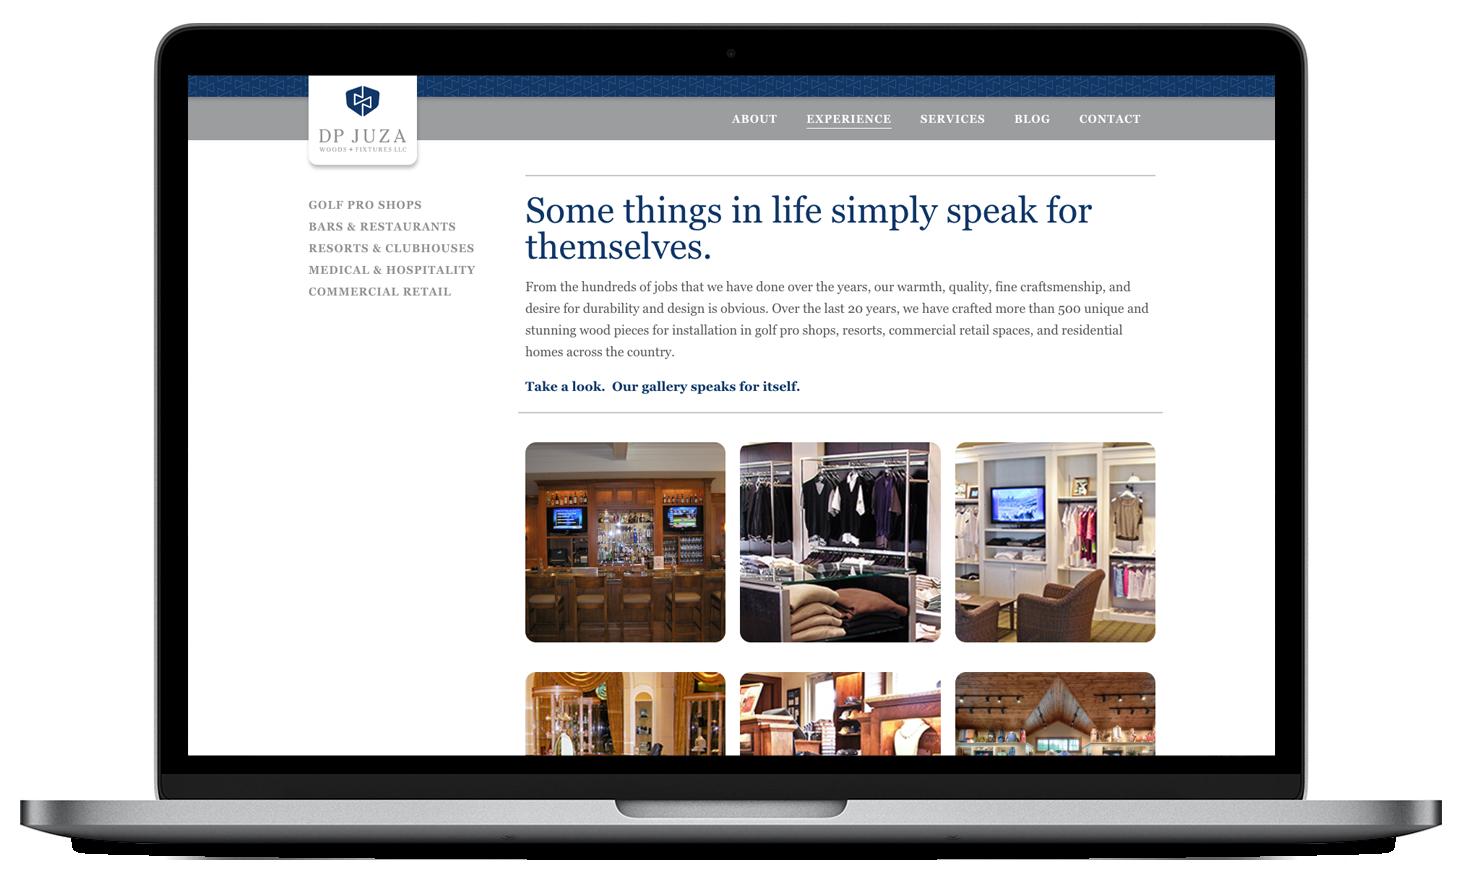 DPJ-Website-Experience